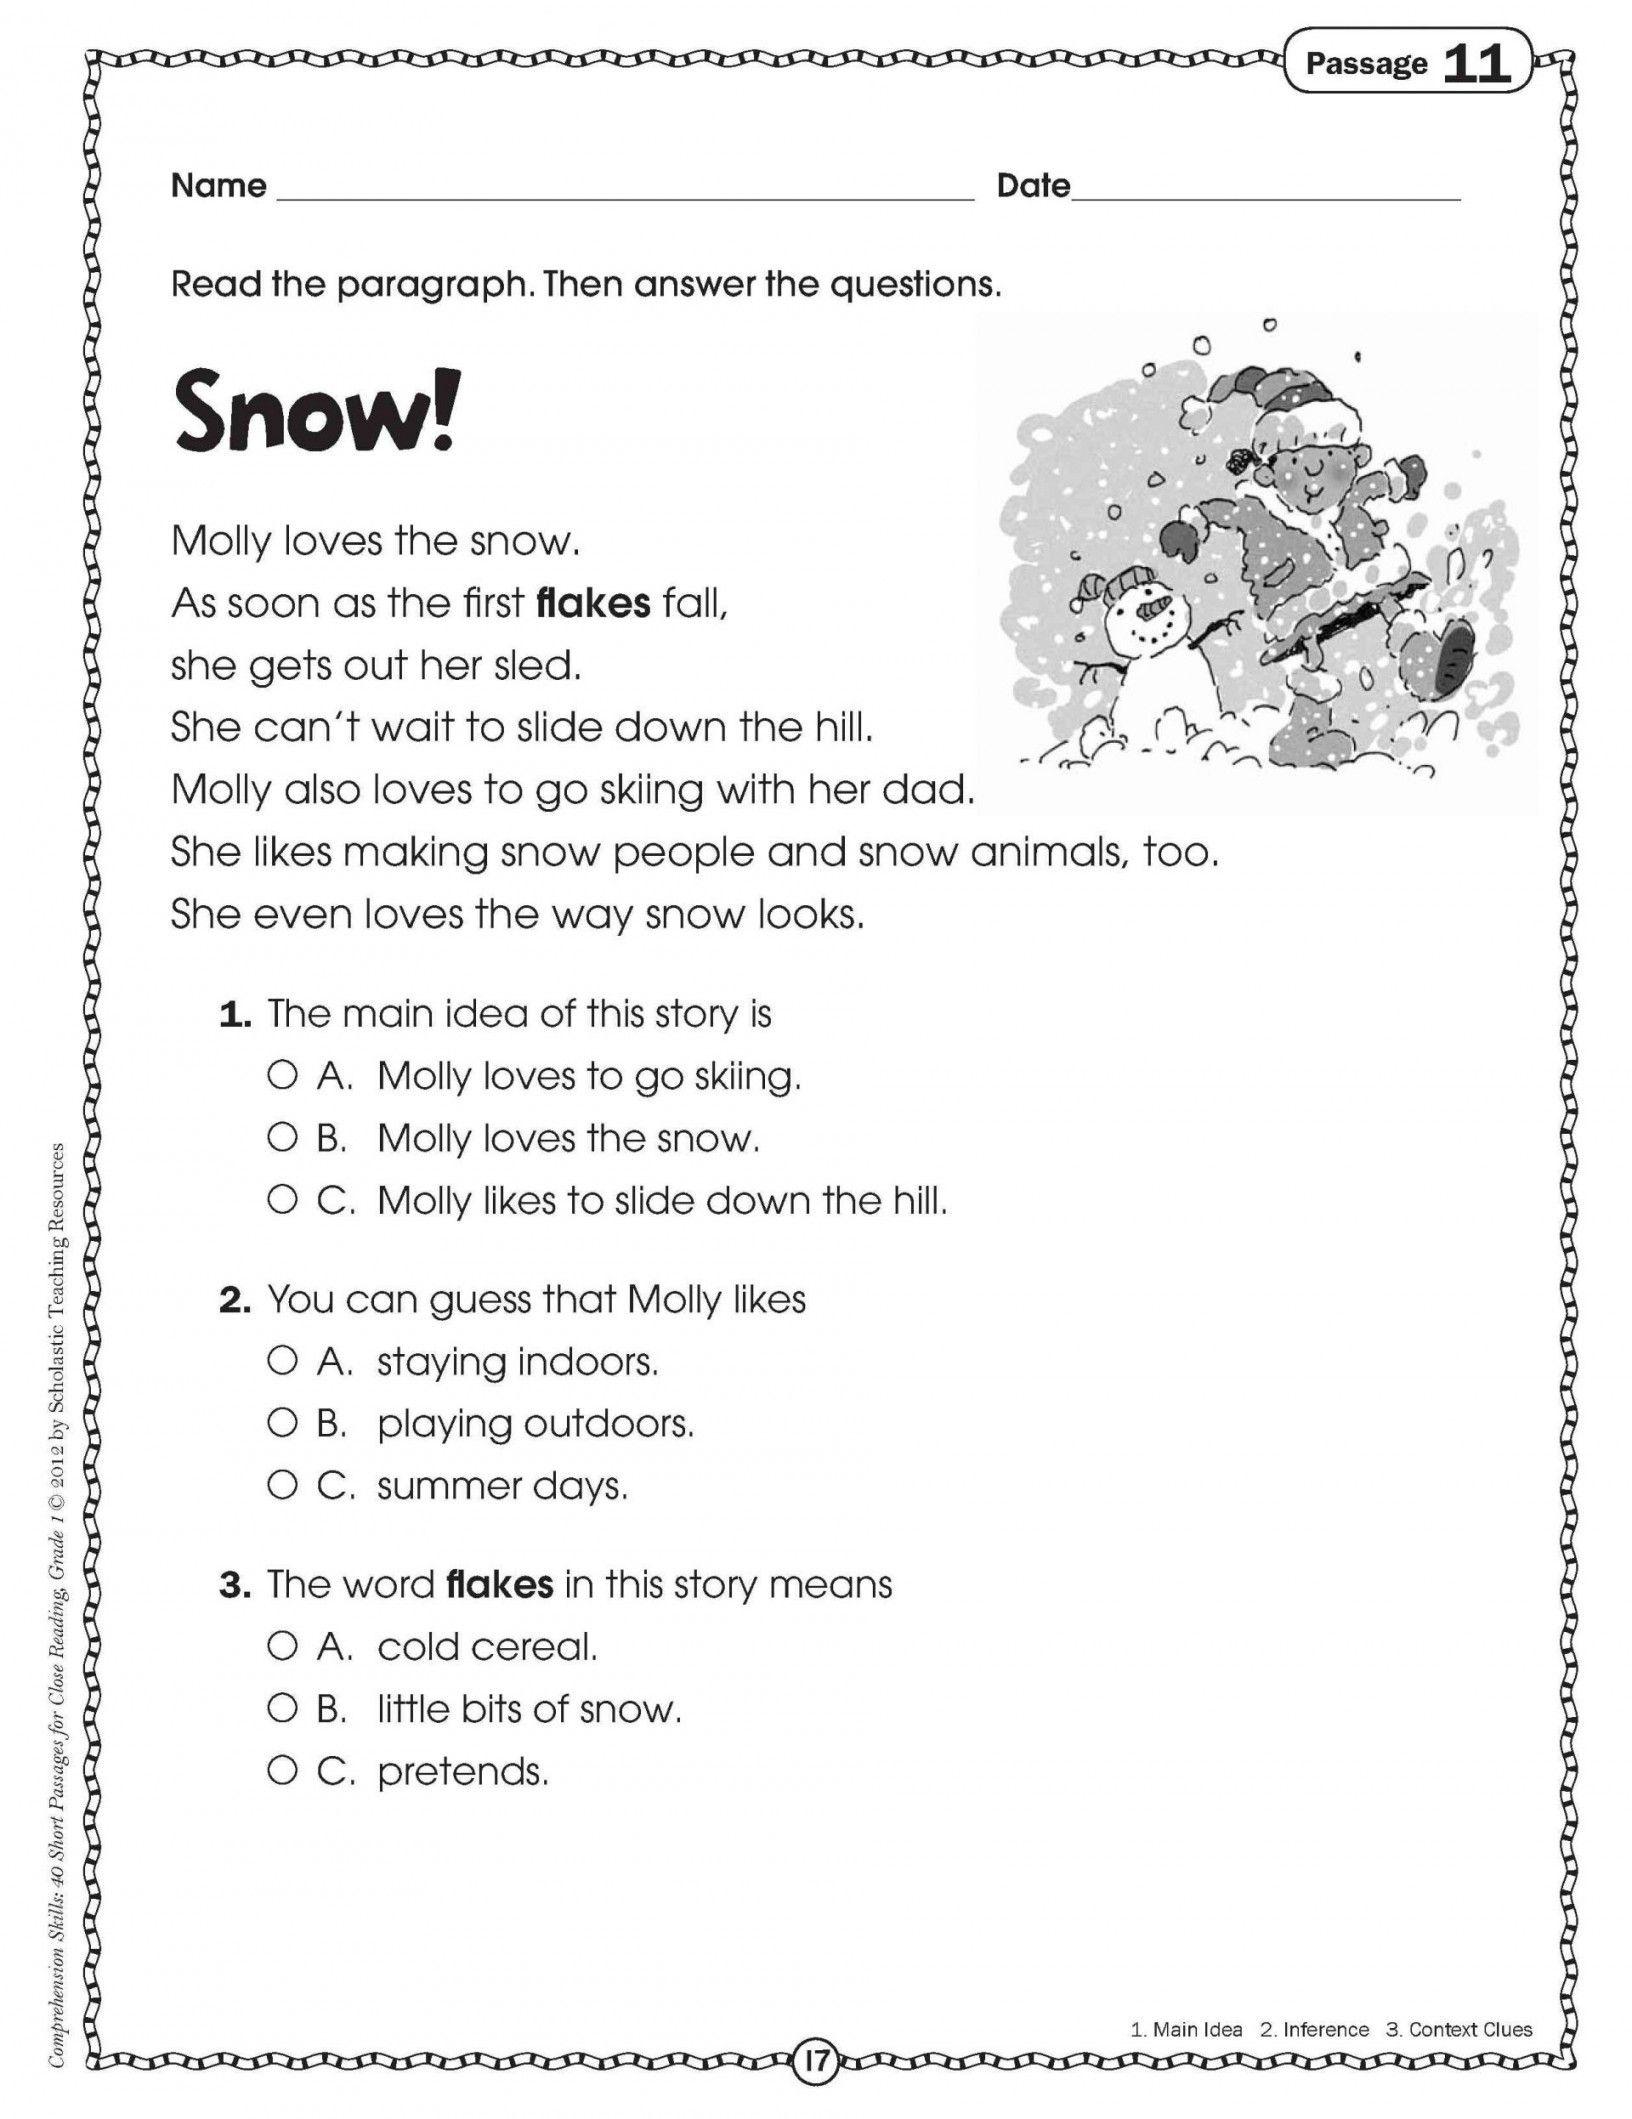 Printable Reading Comprehension Worksheets For Reading Worksheets - Free Printable Reading Comprehension Worksheets For 3Rd Grade